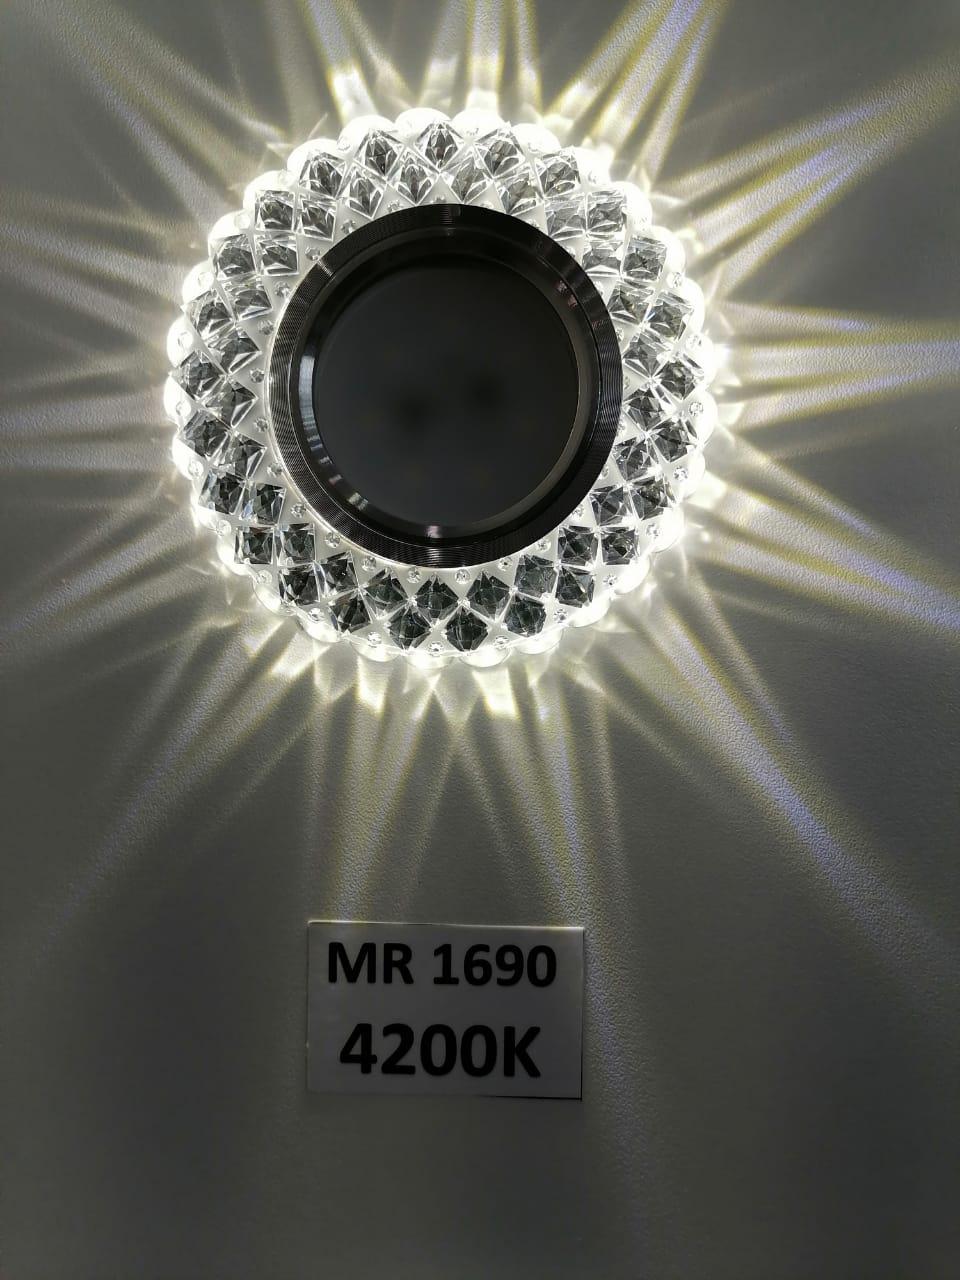 MR 1690